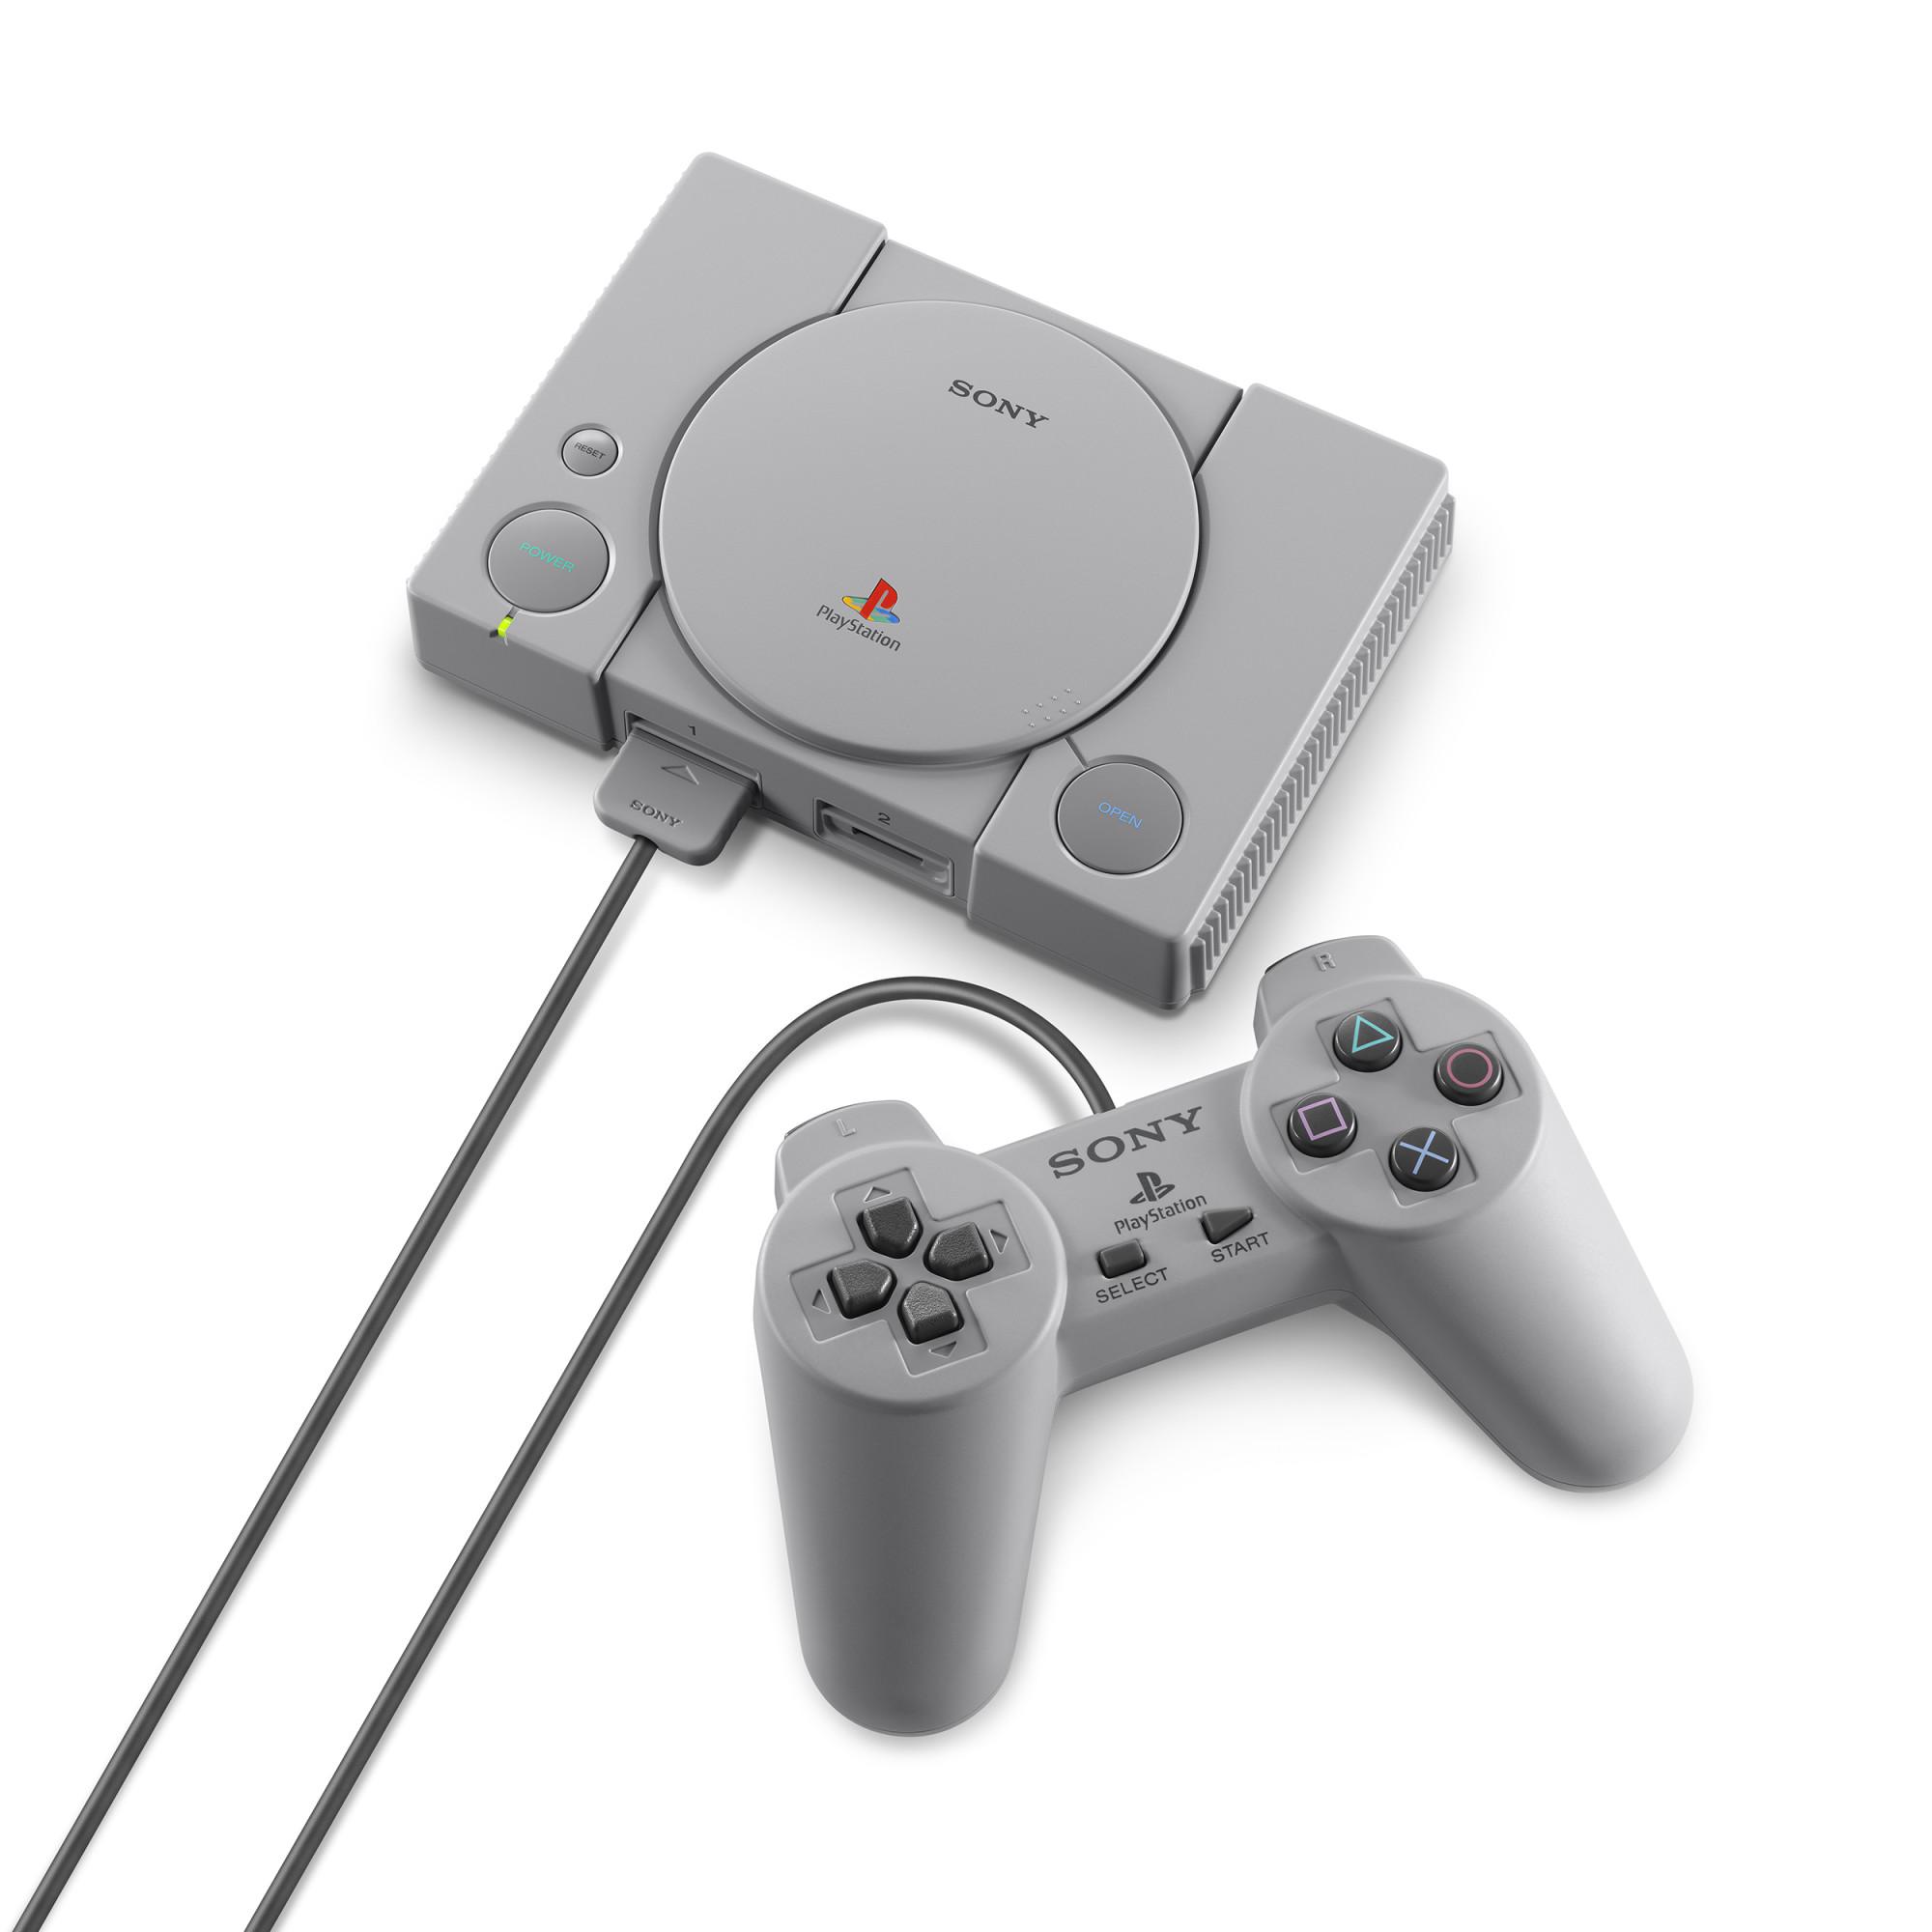 Consola Sony Playstation Classic + 20 jocuri preinstalate 8